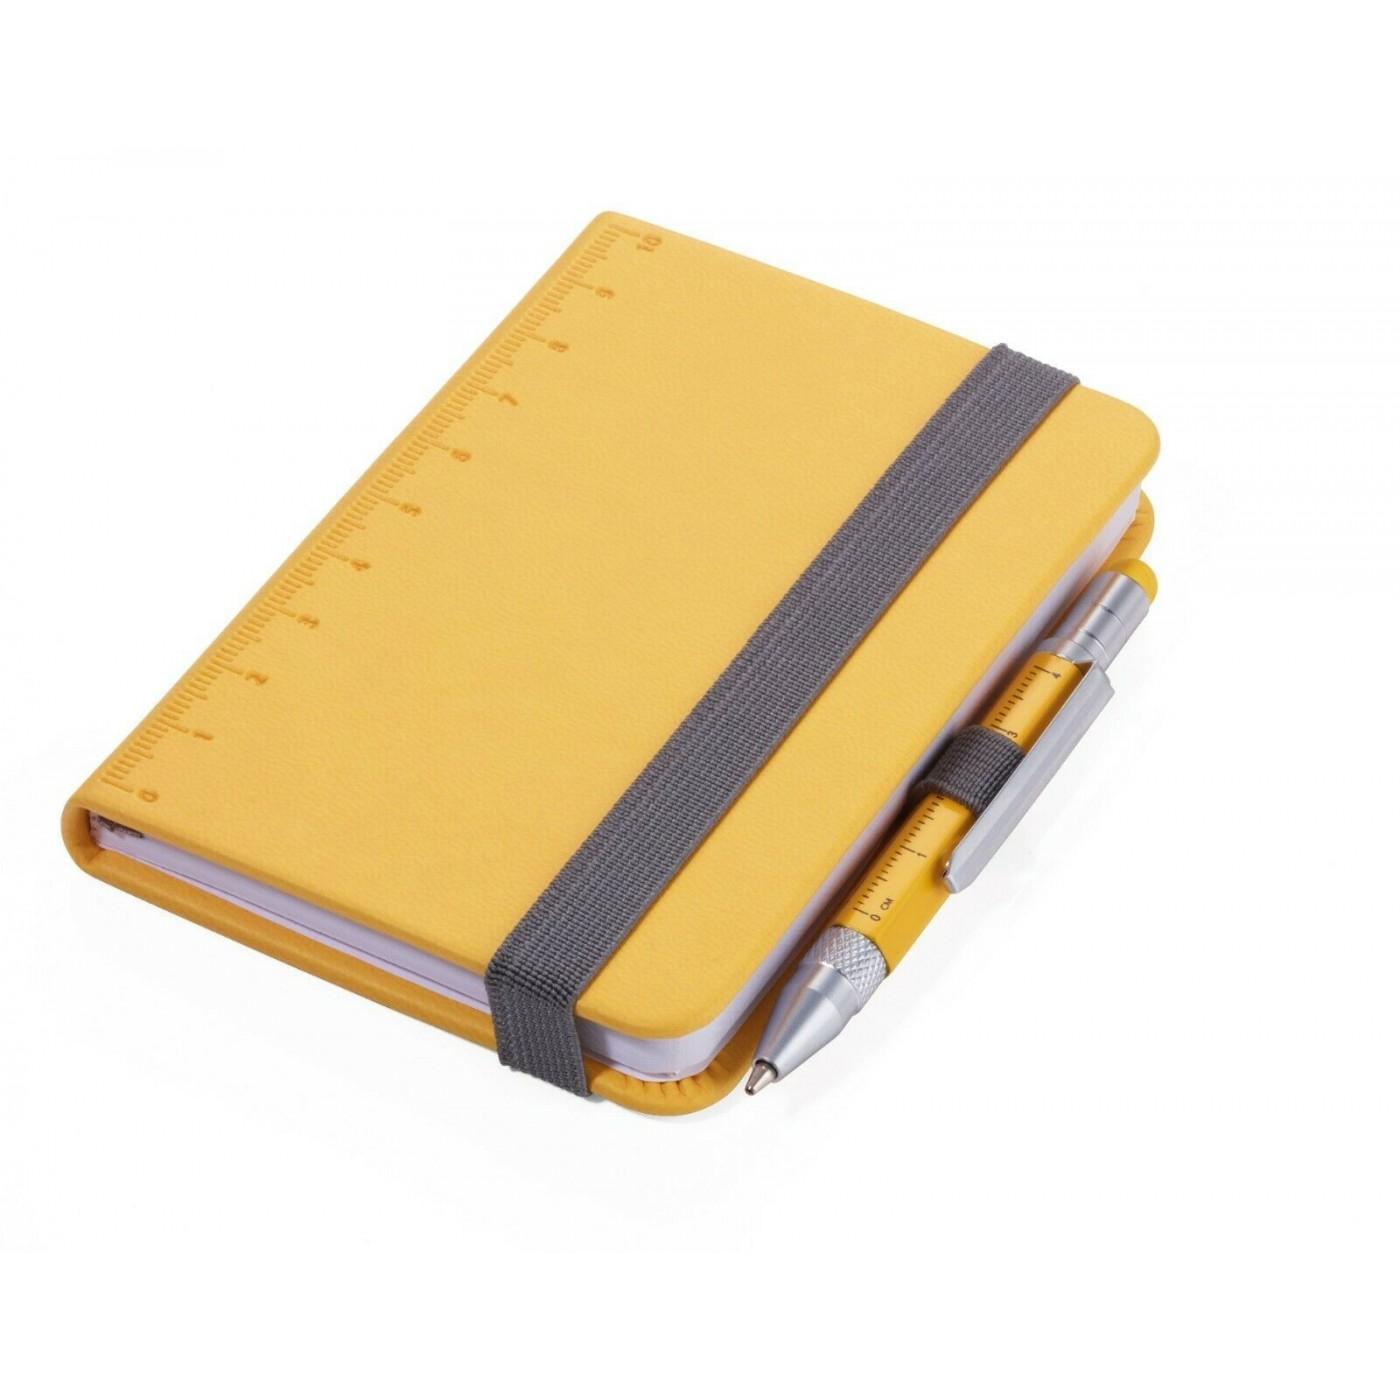 TROIKA Construction penna lilipad + liliput taccuino, giallo